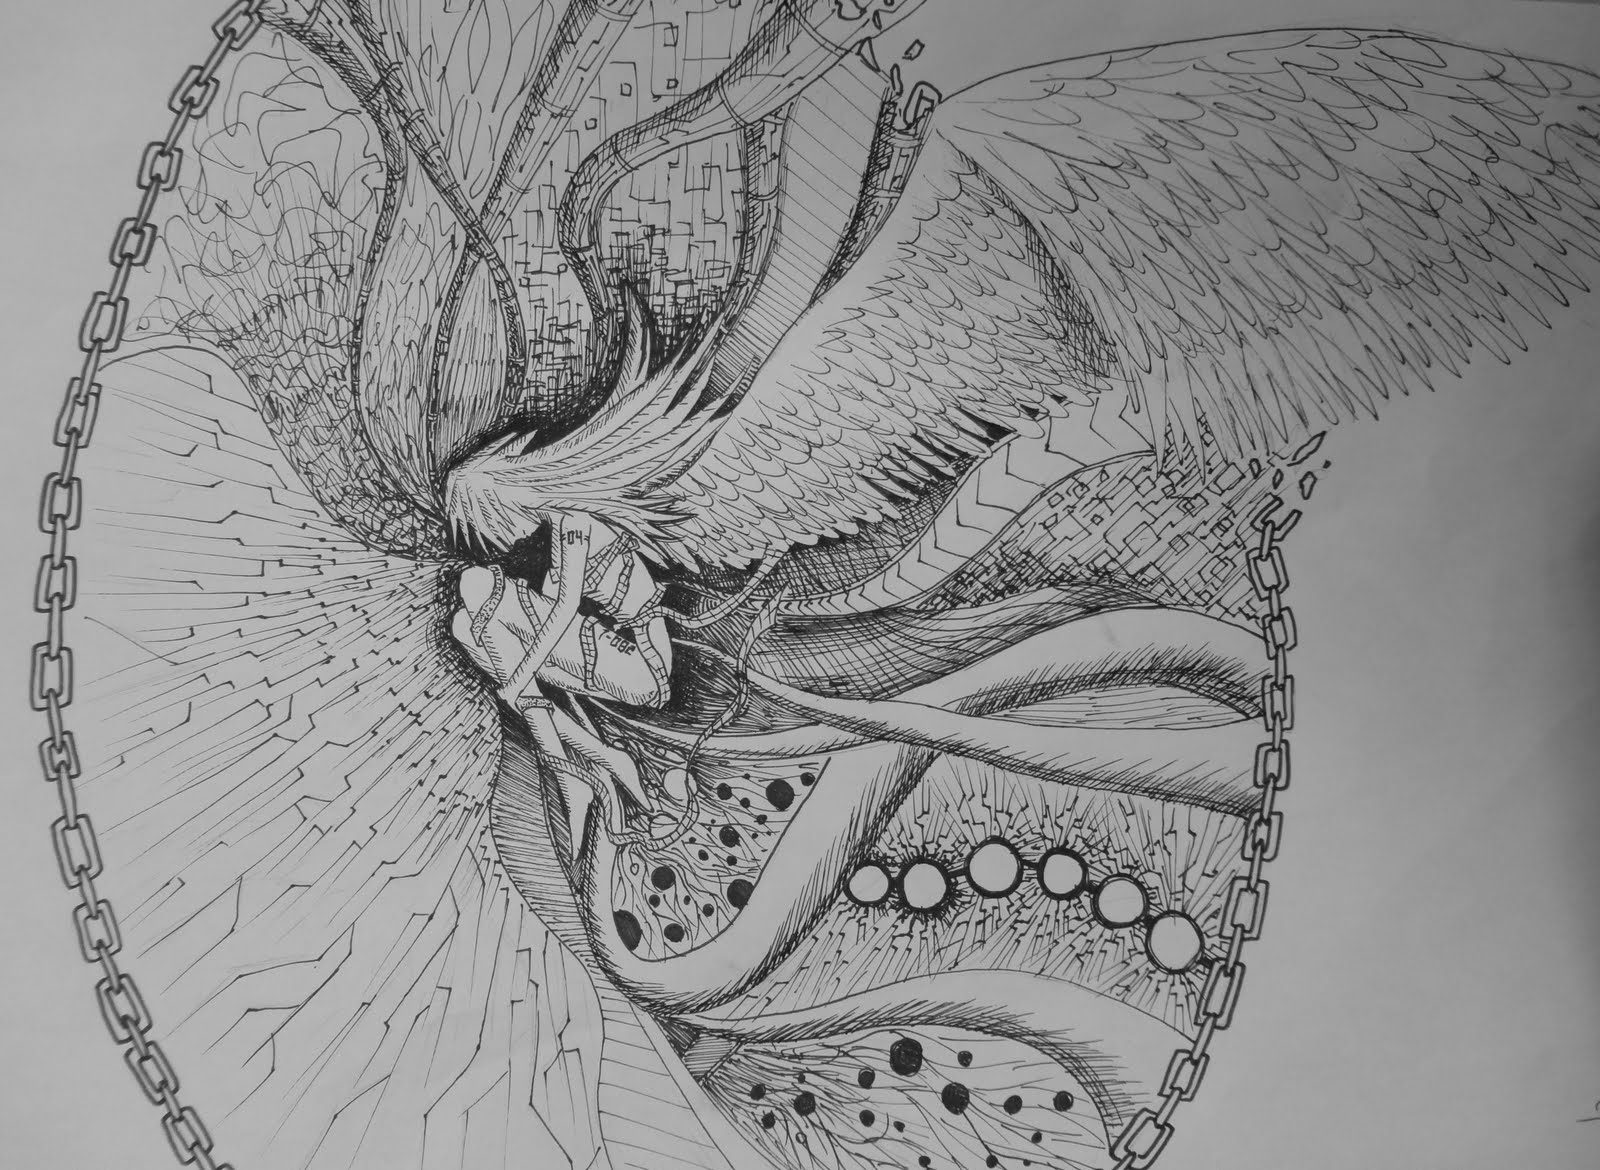 Art Mash: PEN and INK DRAWINGS